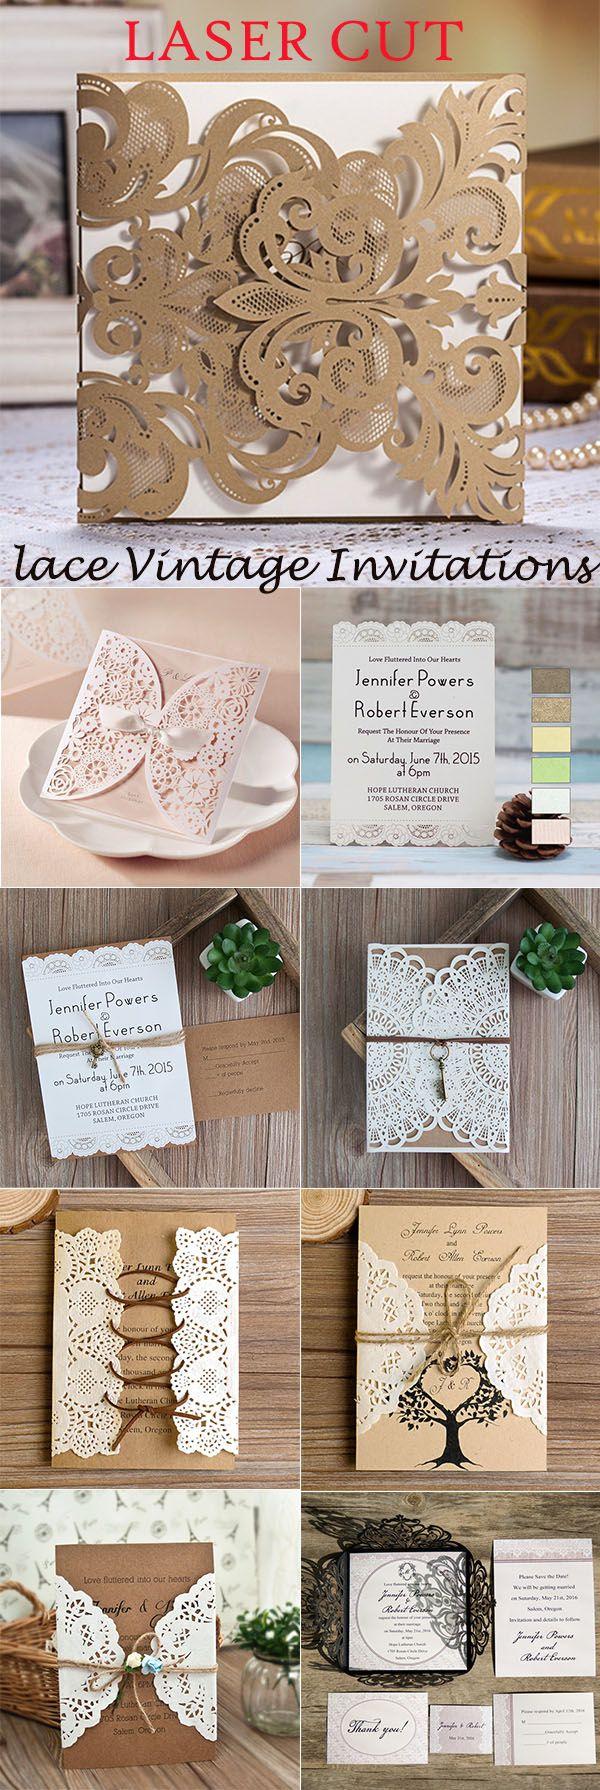 laser cut lace vintage wedding invitations